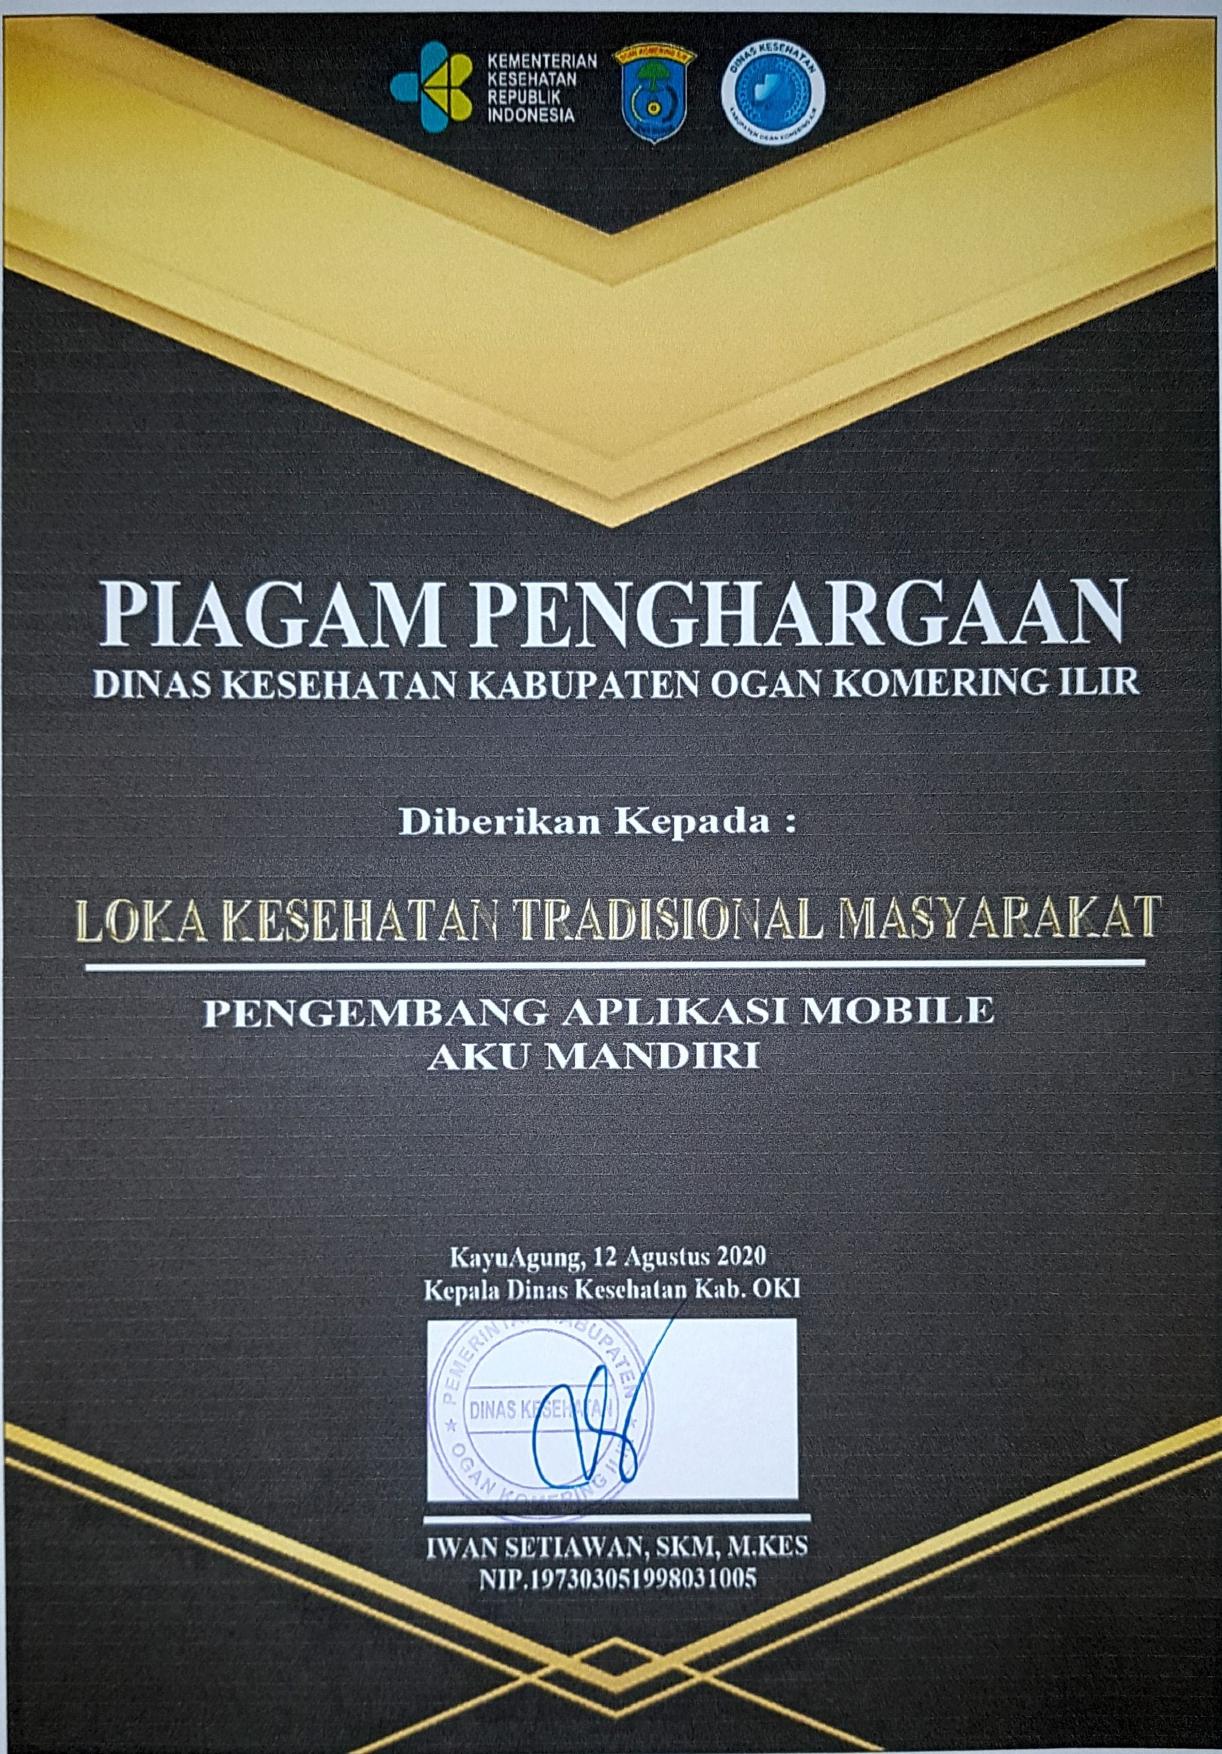 Piagam Penghargaan